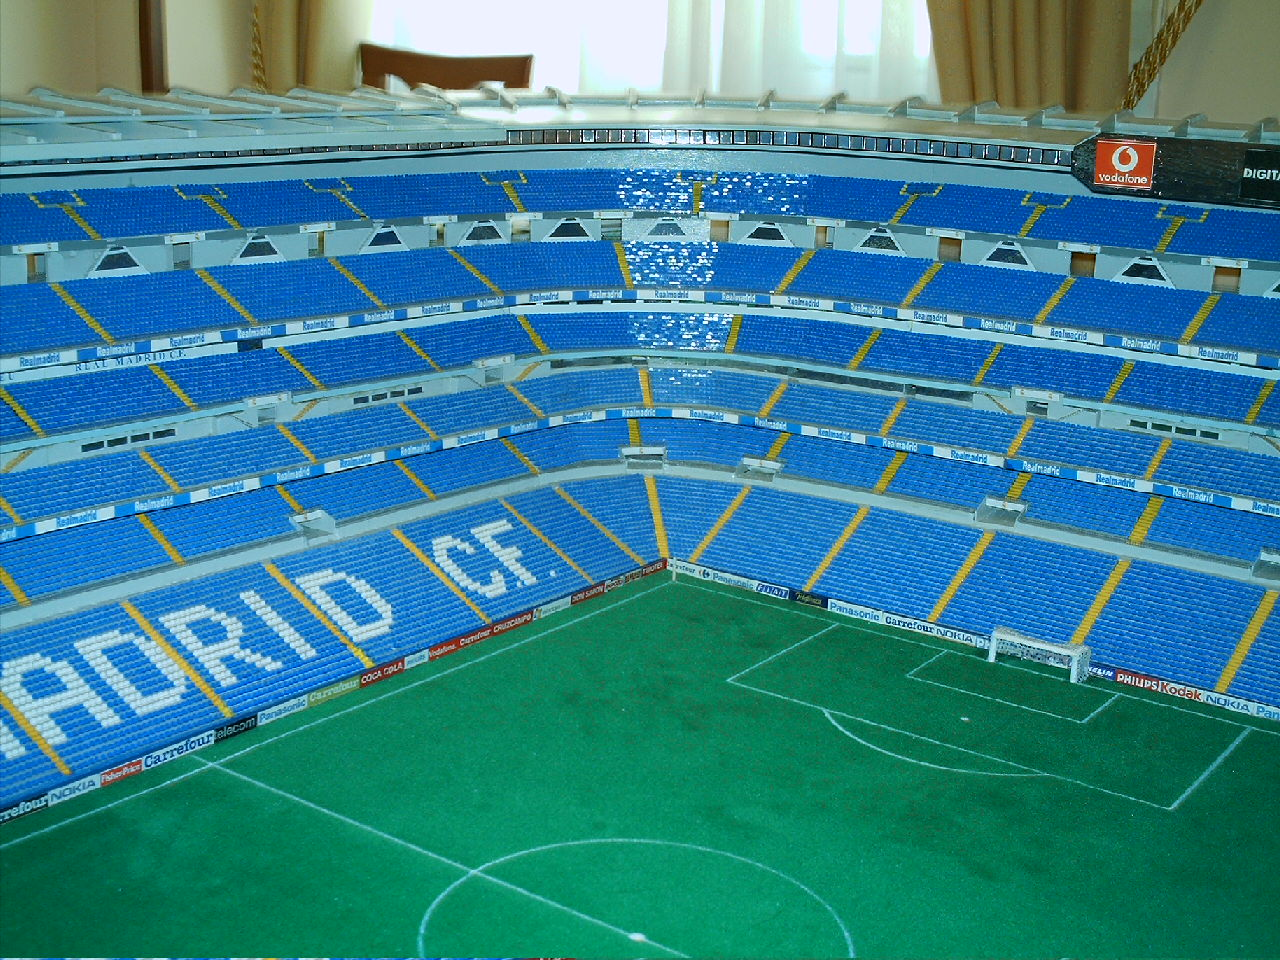 oficial del real madrid la maqueta del estadio una maqueta digna de